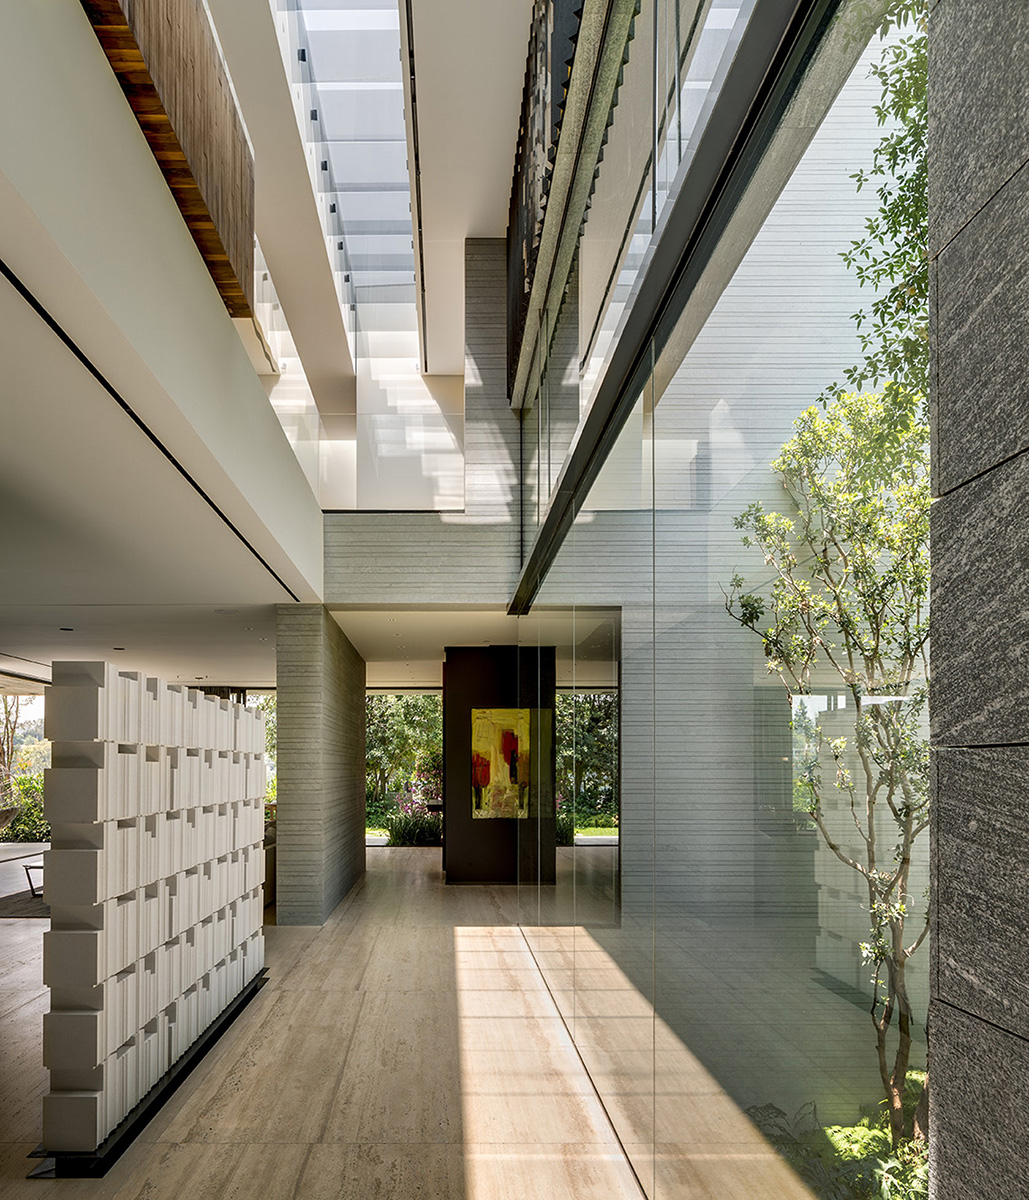 04-casa-cuatro-migdal-arquitectos-foto-rafael-gamo-fasi